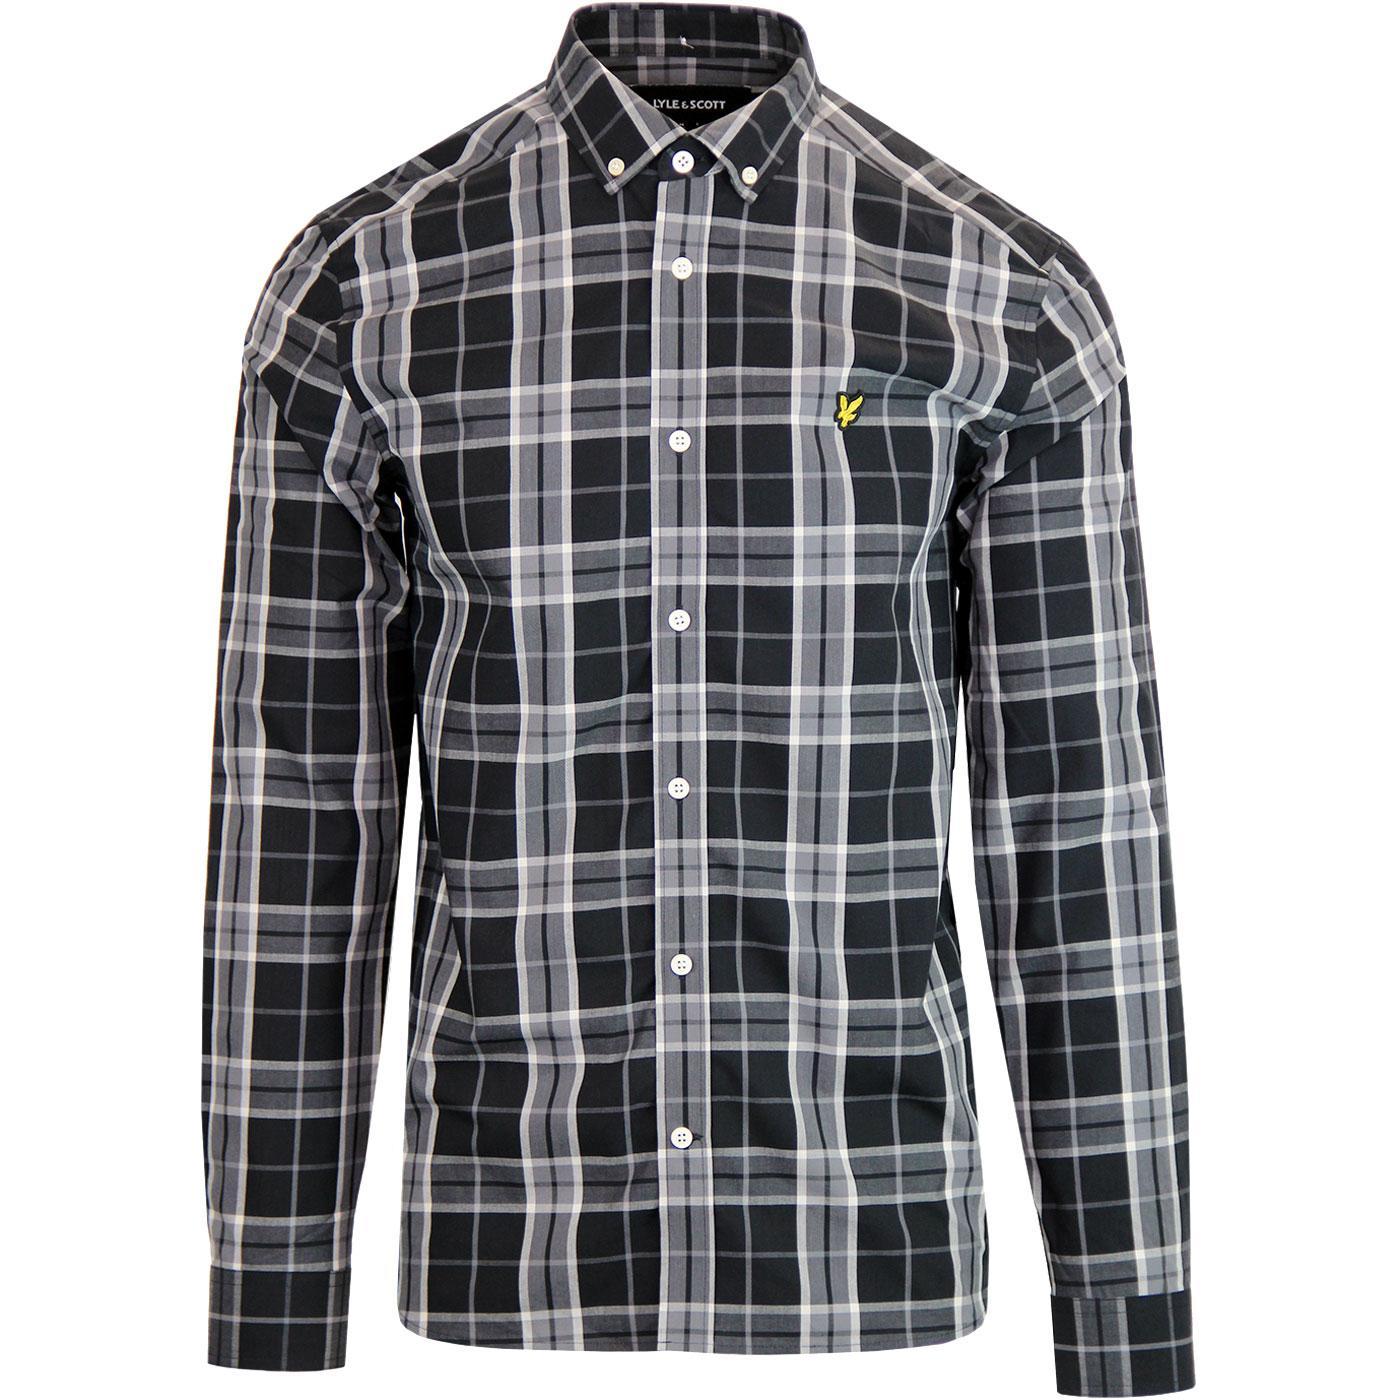 LYLE & SCOTT Retro Poplin Check Button Down Shirt